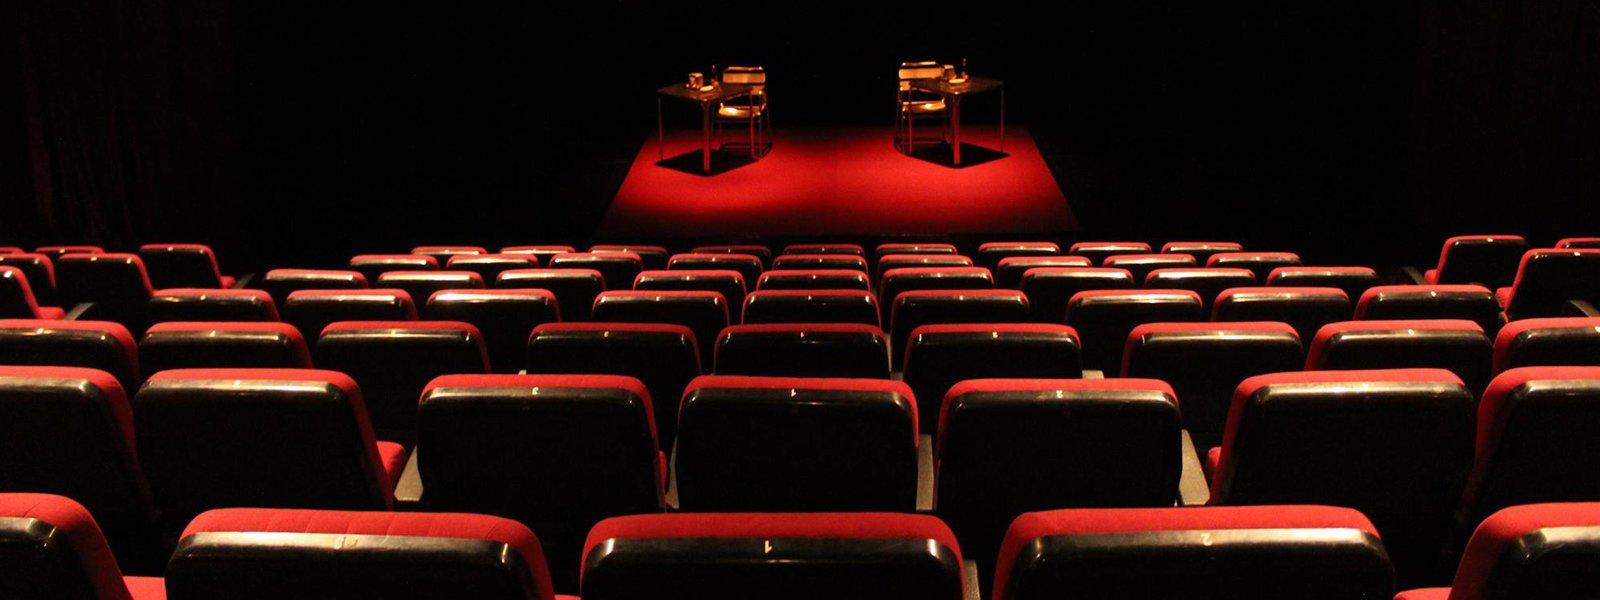 Teatre Micalet, venue for shows representation